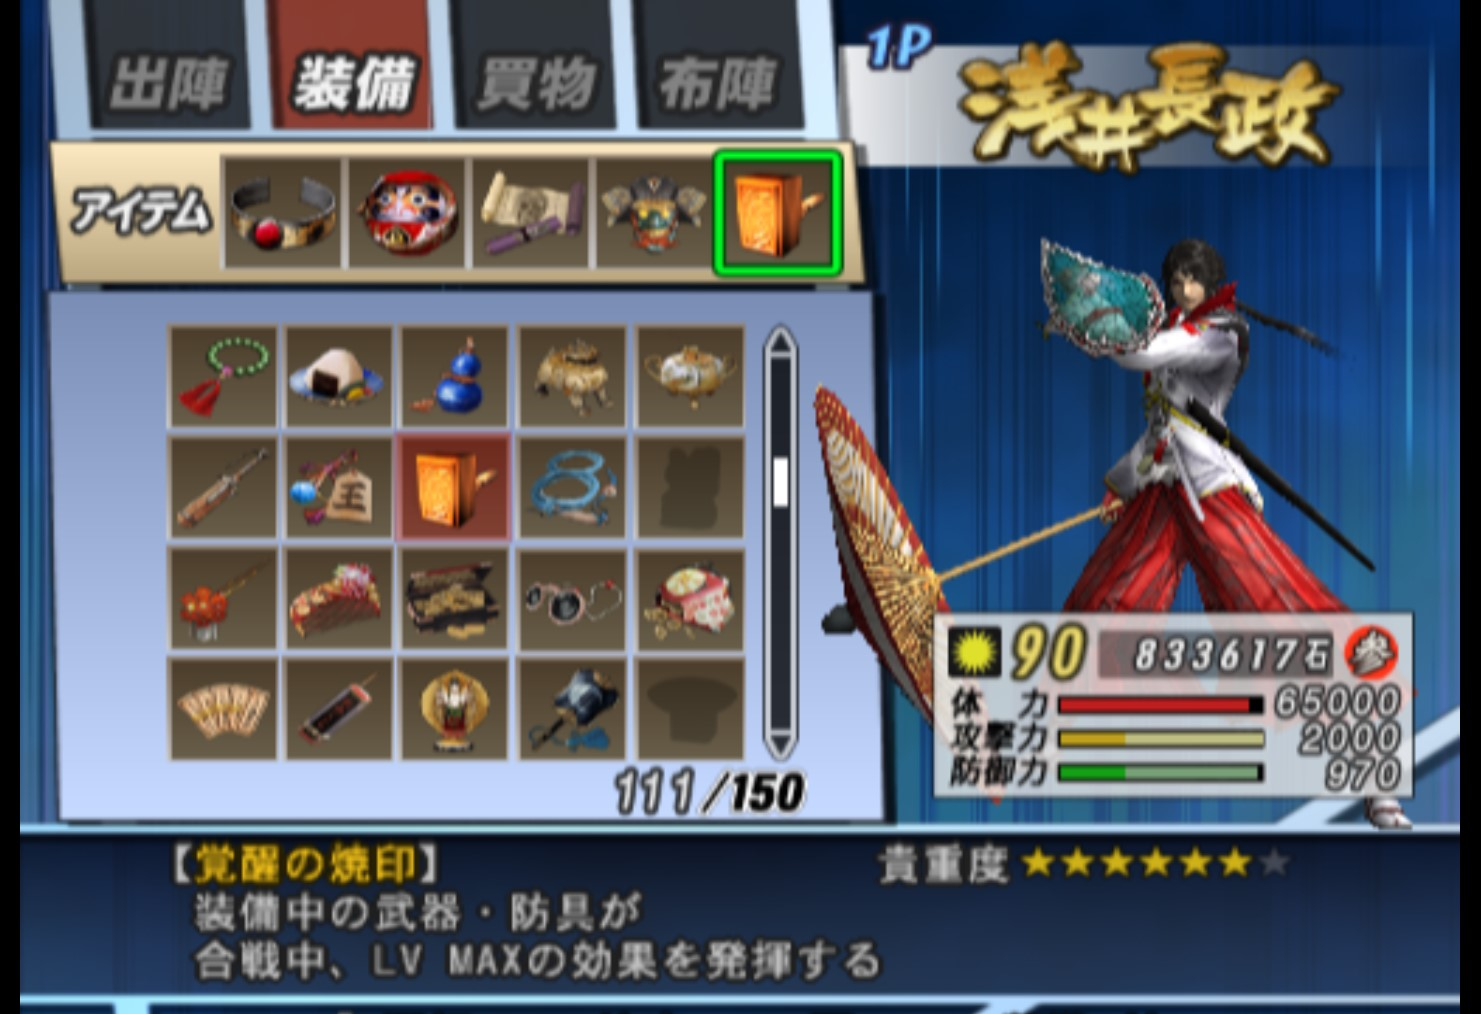 bapak waset gaming tutor how to dealt massive damage basara 2 heroes